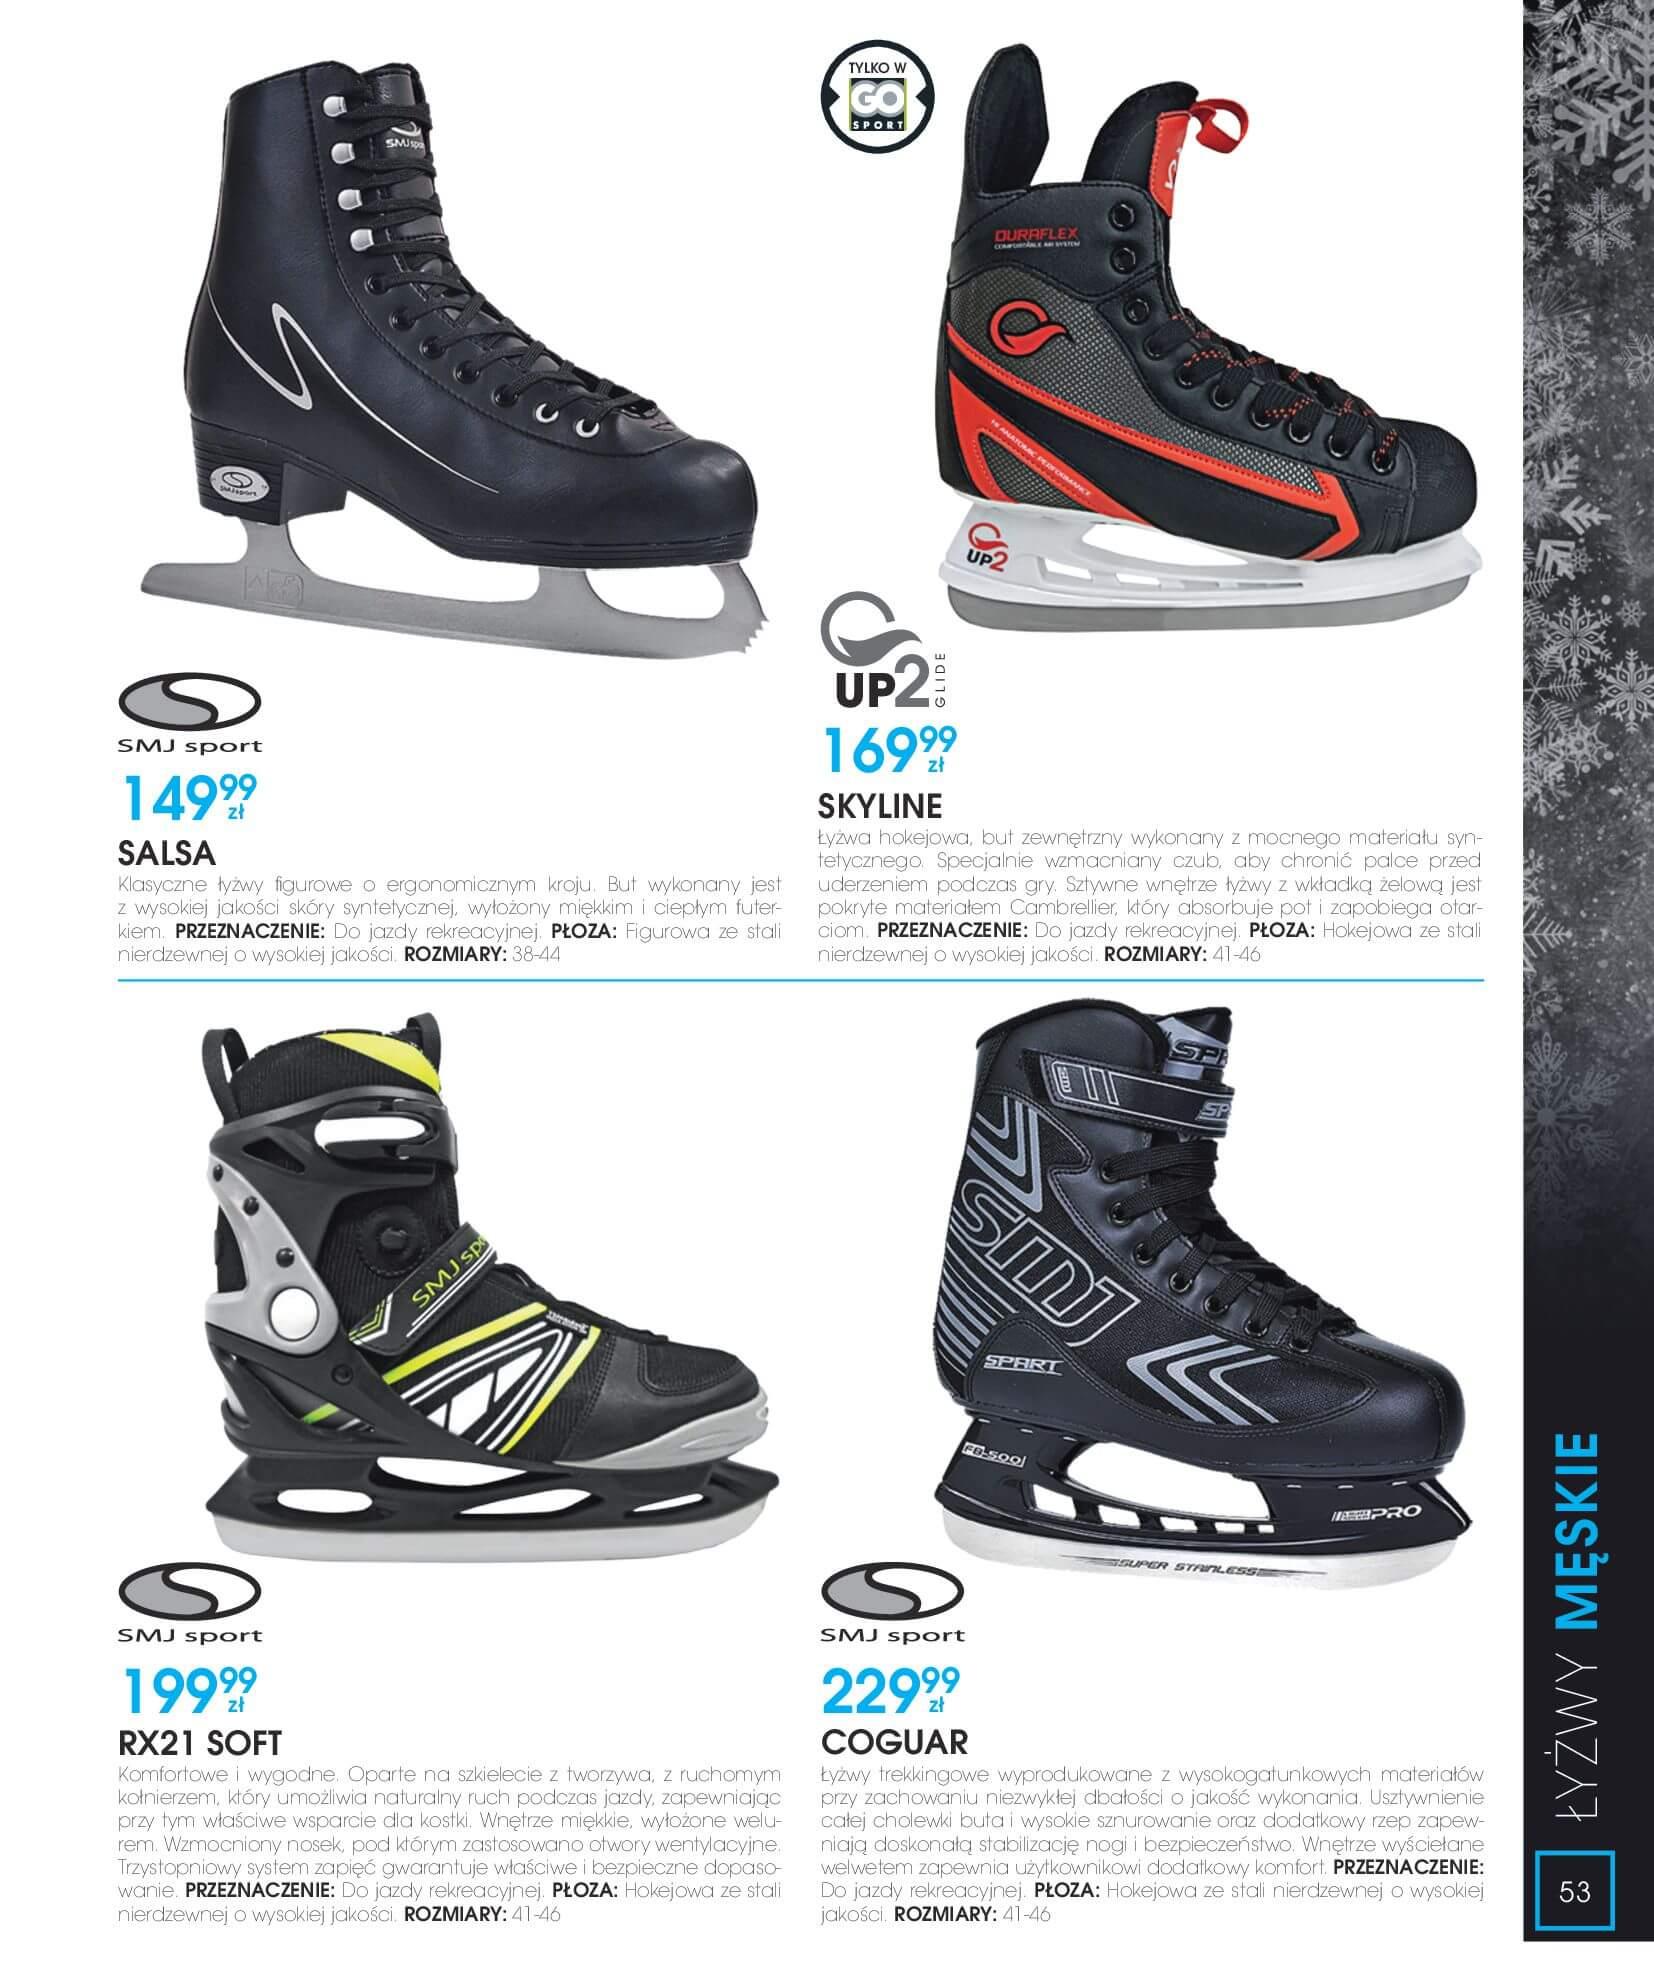 Gazetka Go Sport - Katalog Zima 2017/2018-12.11.2017-28.02.2018-page-53